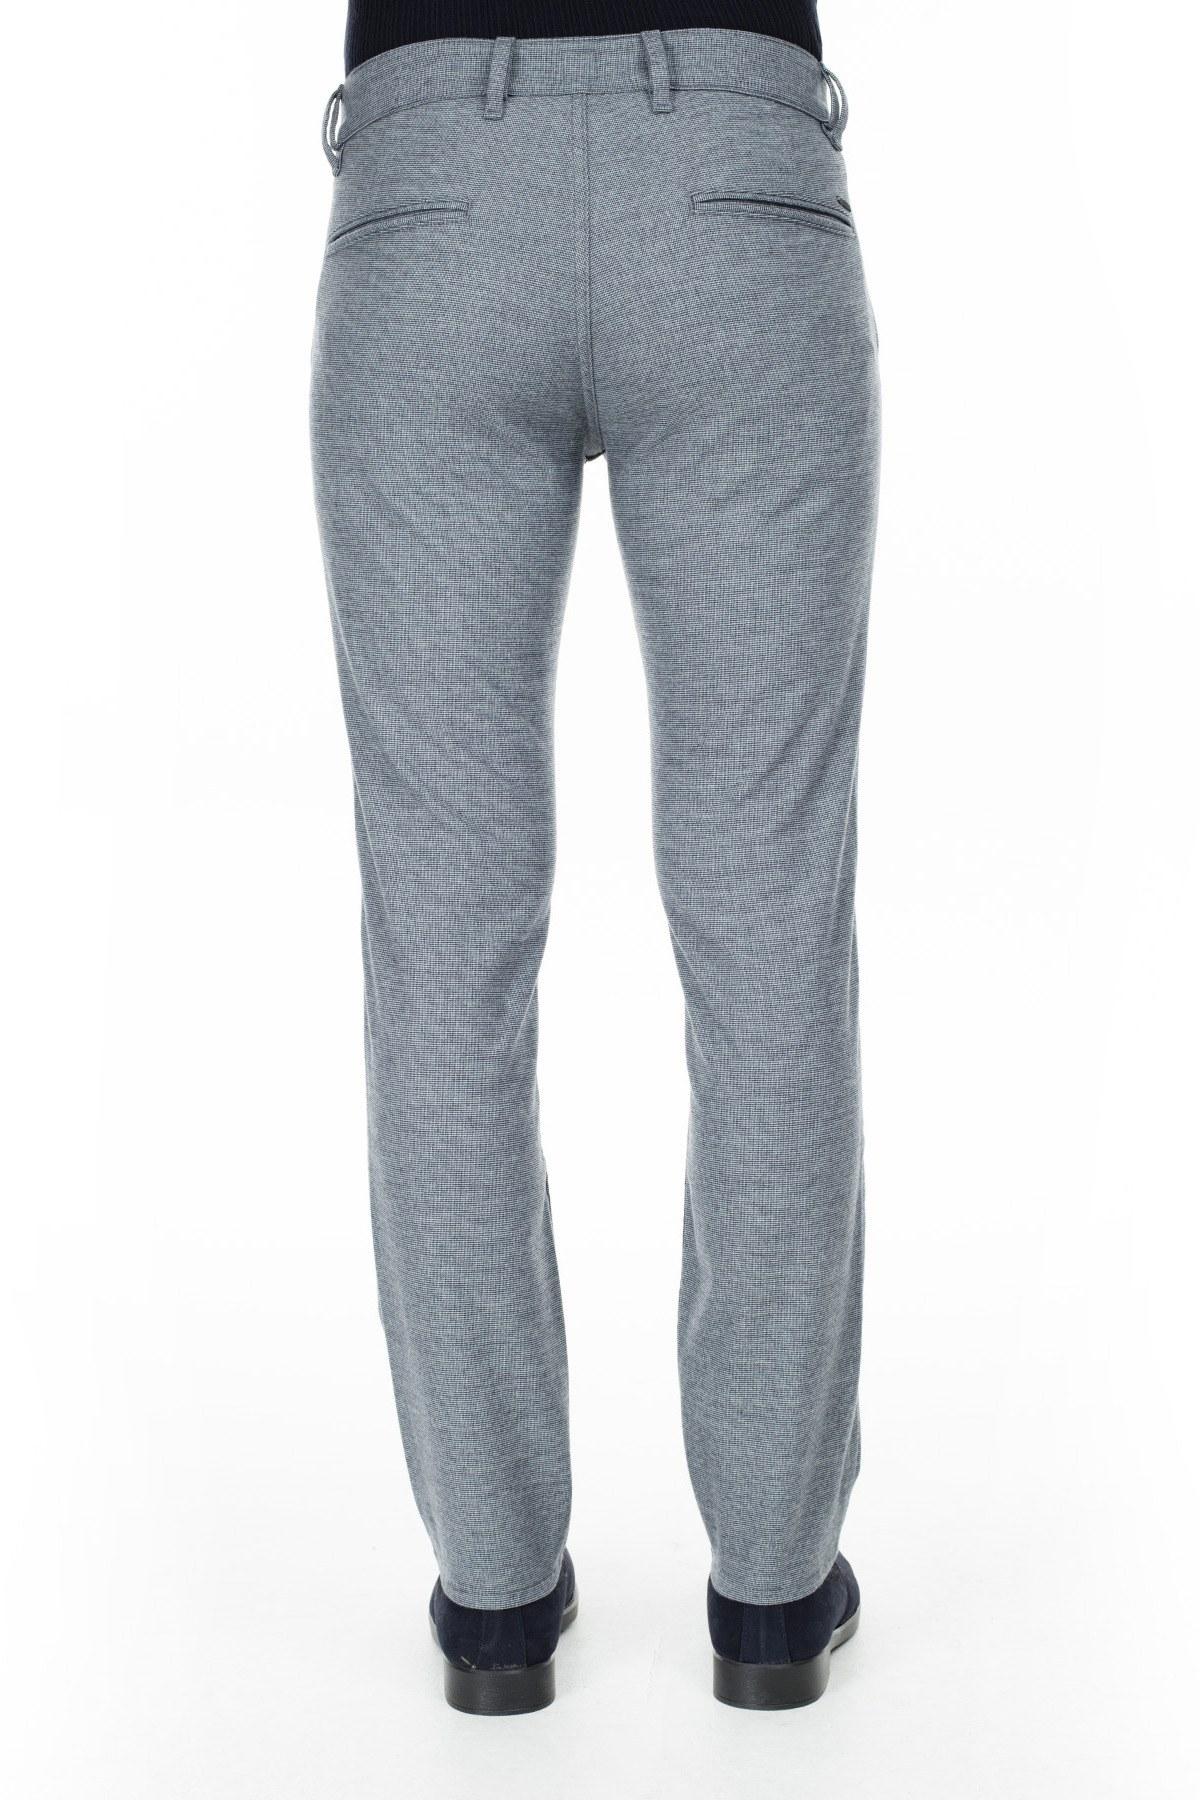 Hugo Boss Erkek Pantolon 50413857 404 GRİ